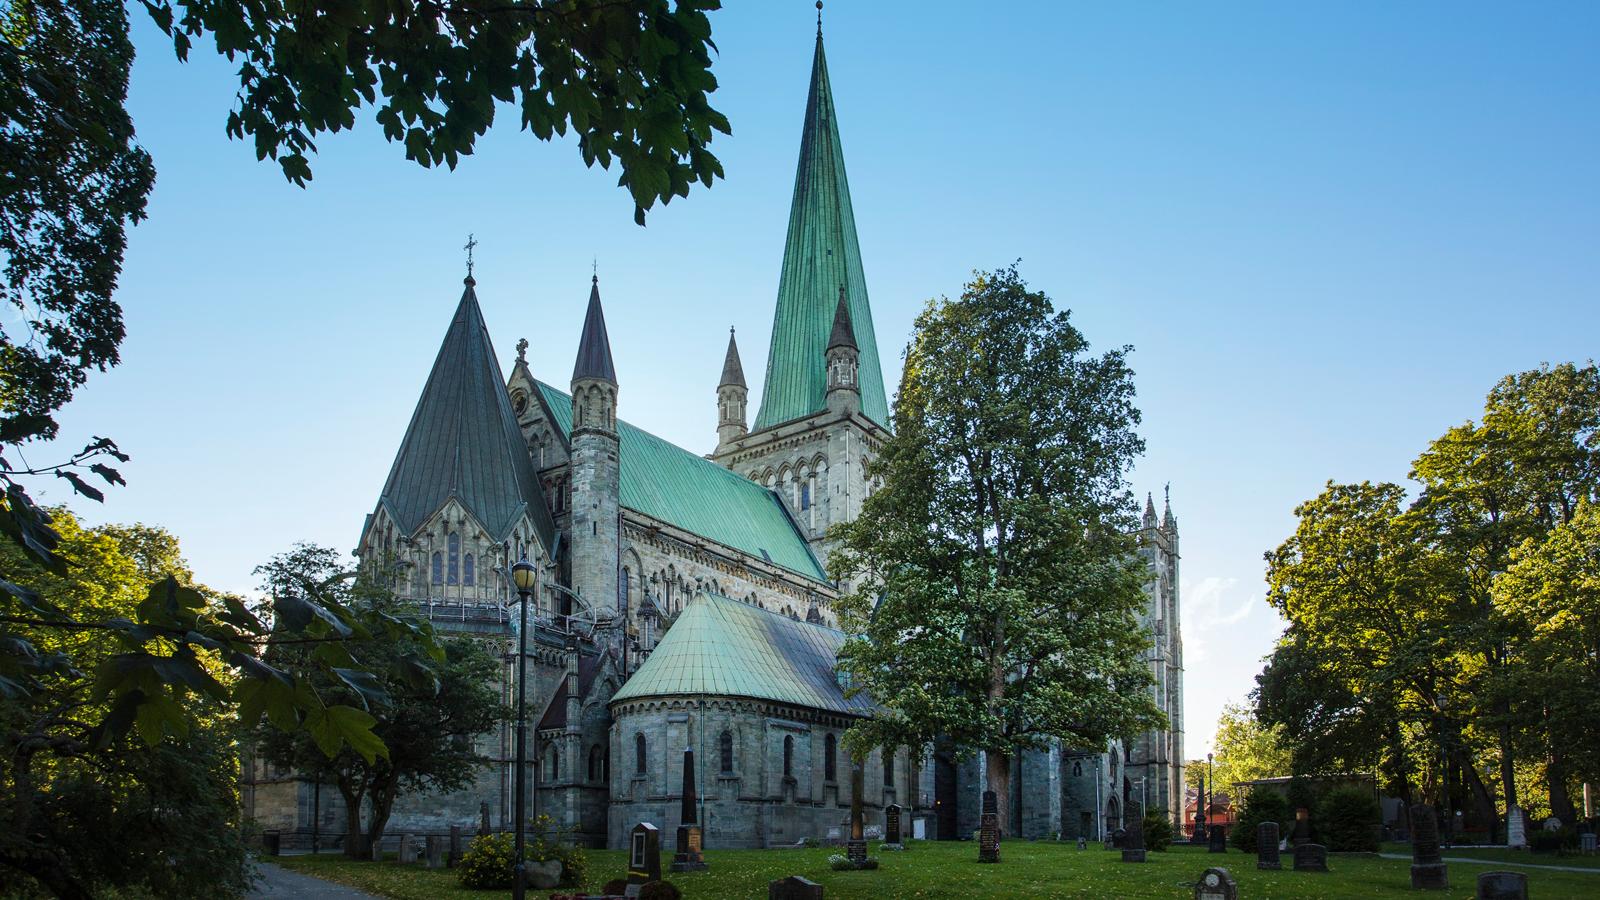 Nidarosdomen i Trondheim. Foto: Jan Ove Iversen - overpari.no / trondelag.com